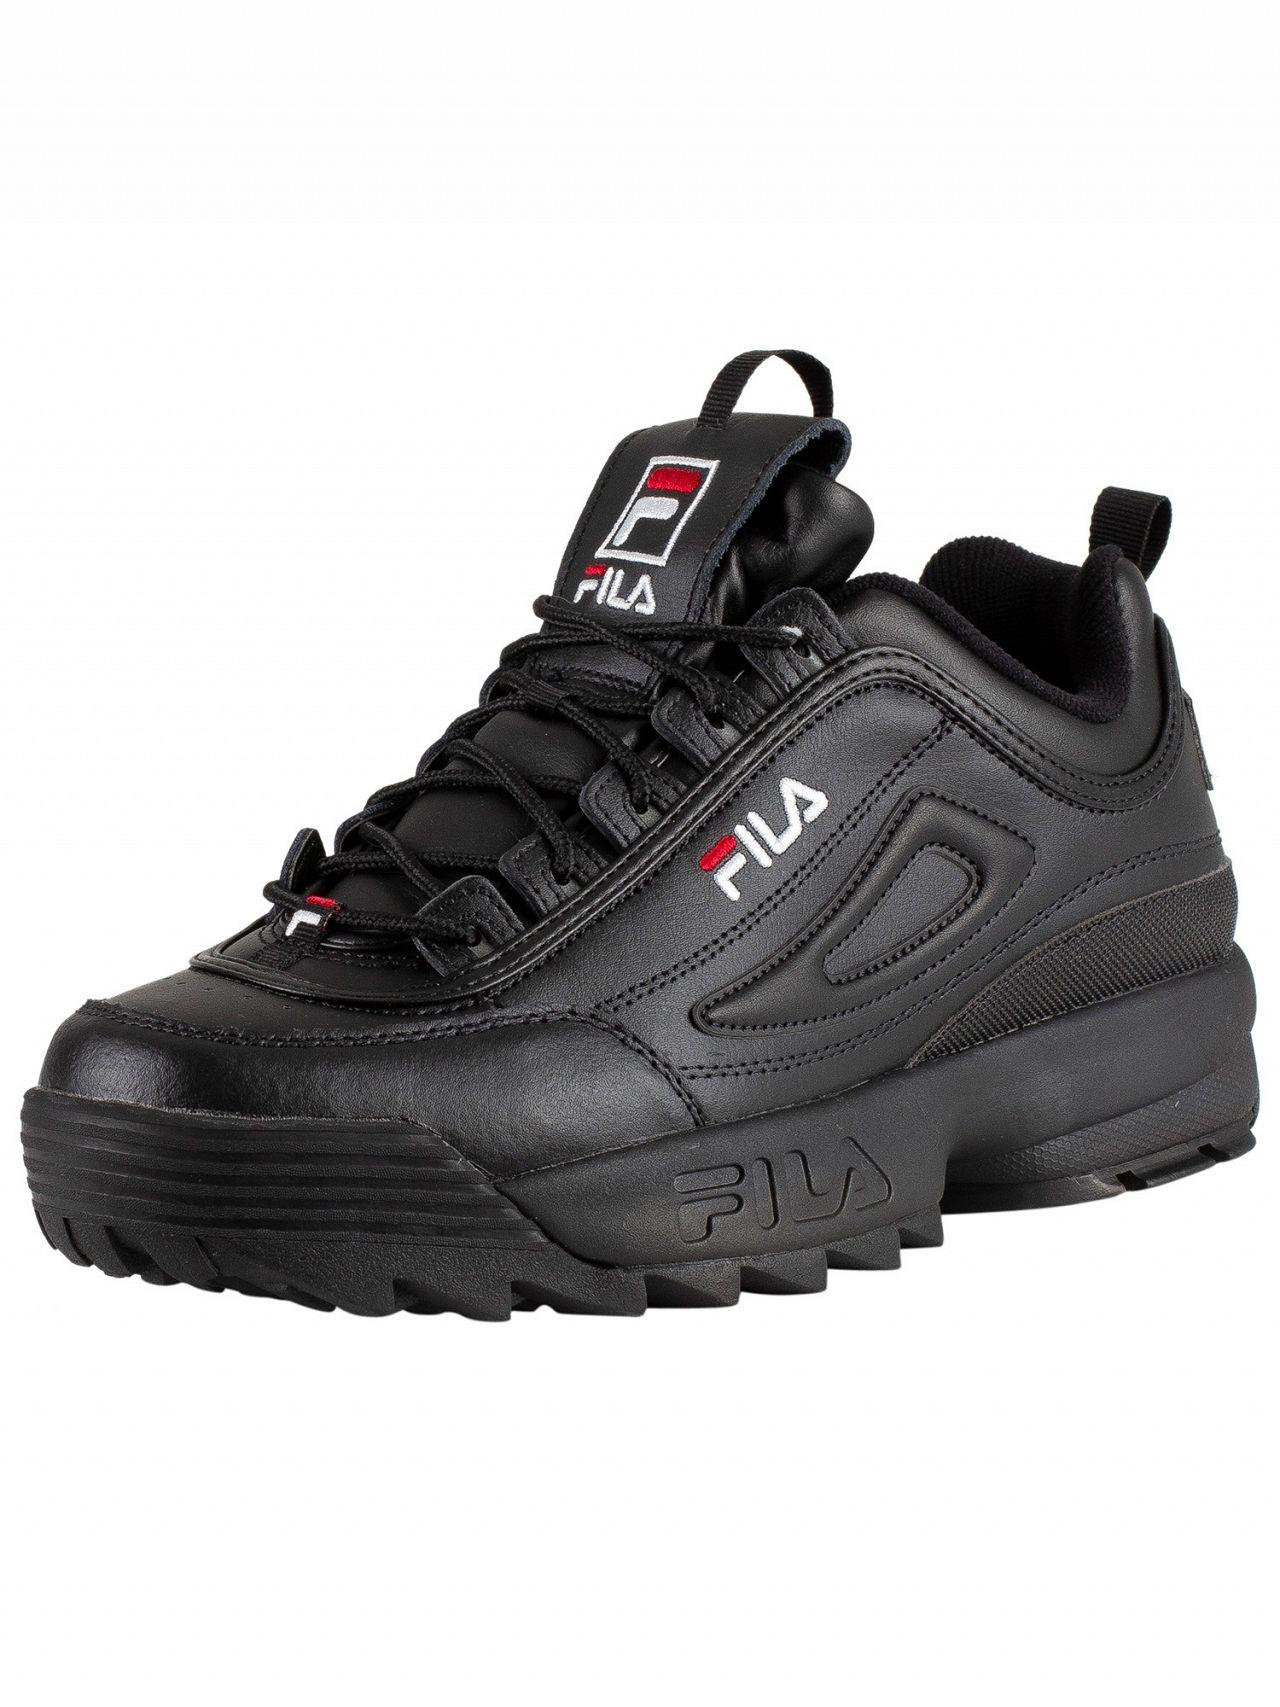 7936a6c7e3 Fila Black/White/Red Disruptor II Premium Trainers